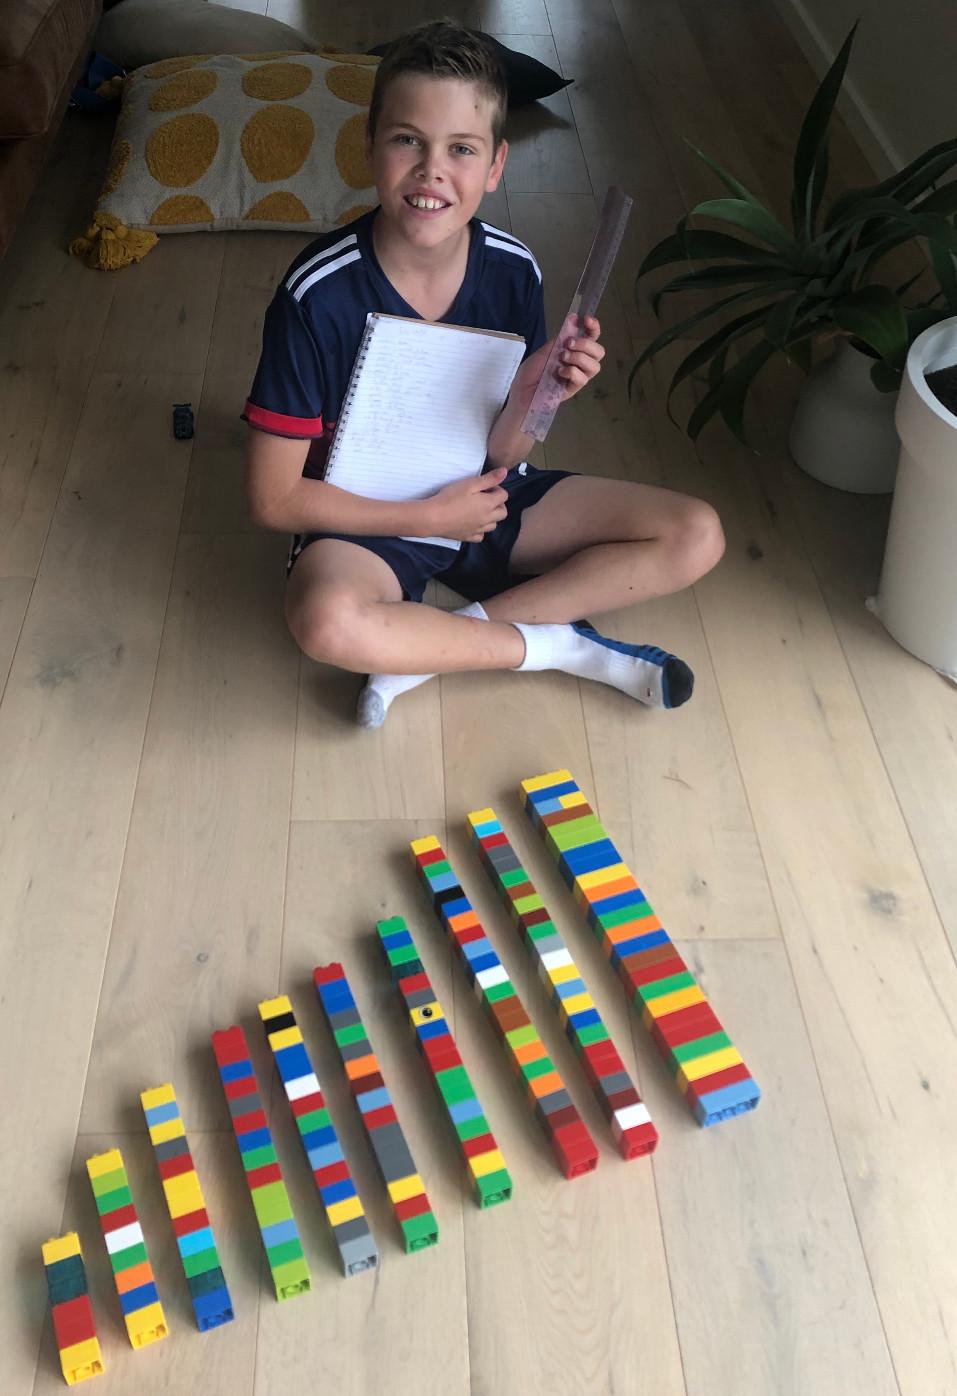 compare-measure-building-blocks-maths-lessons